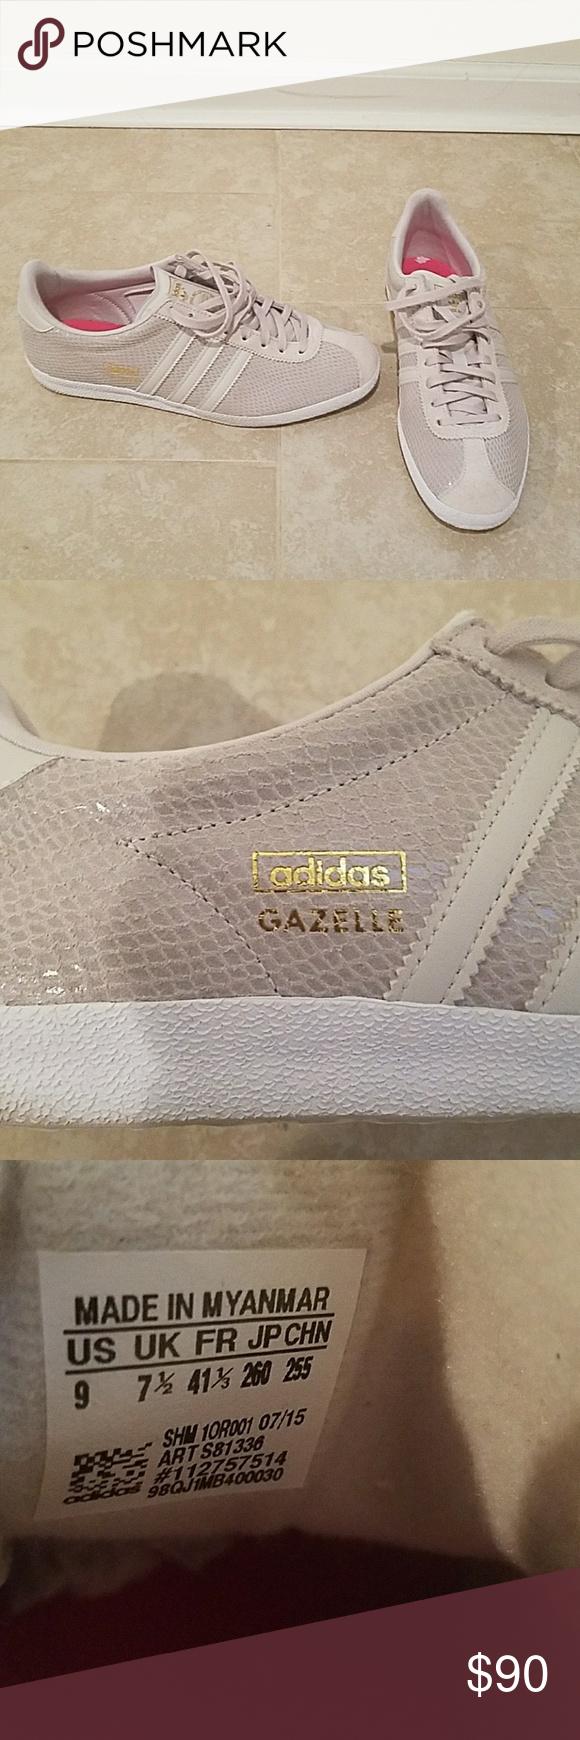 Adidas Gazelle | Adidas gazelle, Taupe